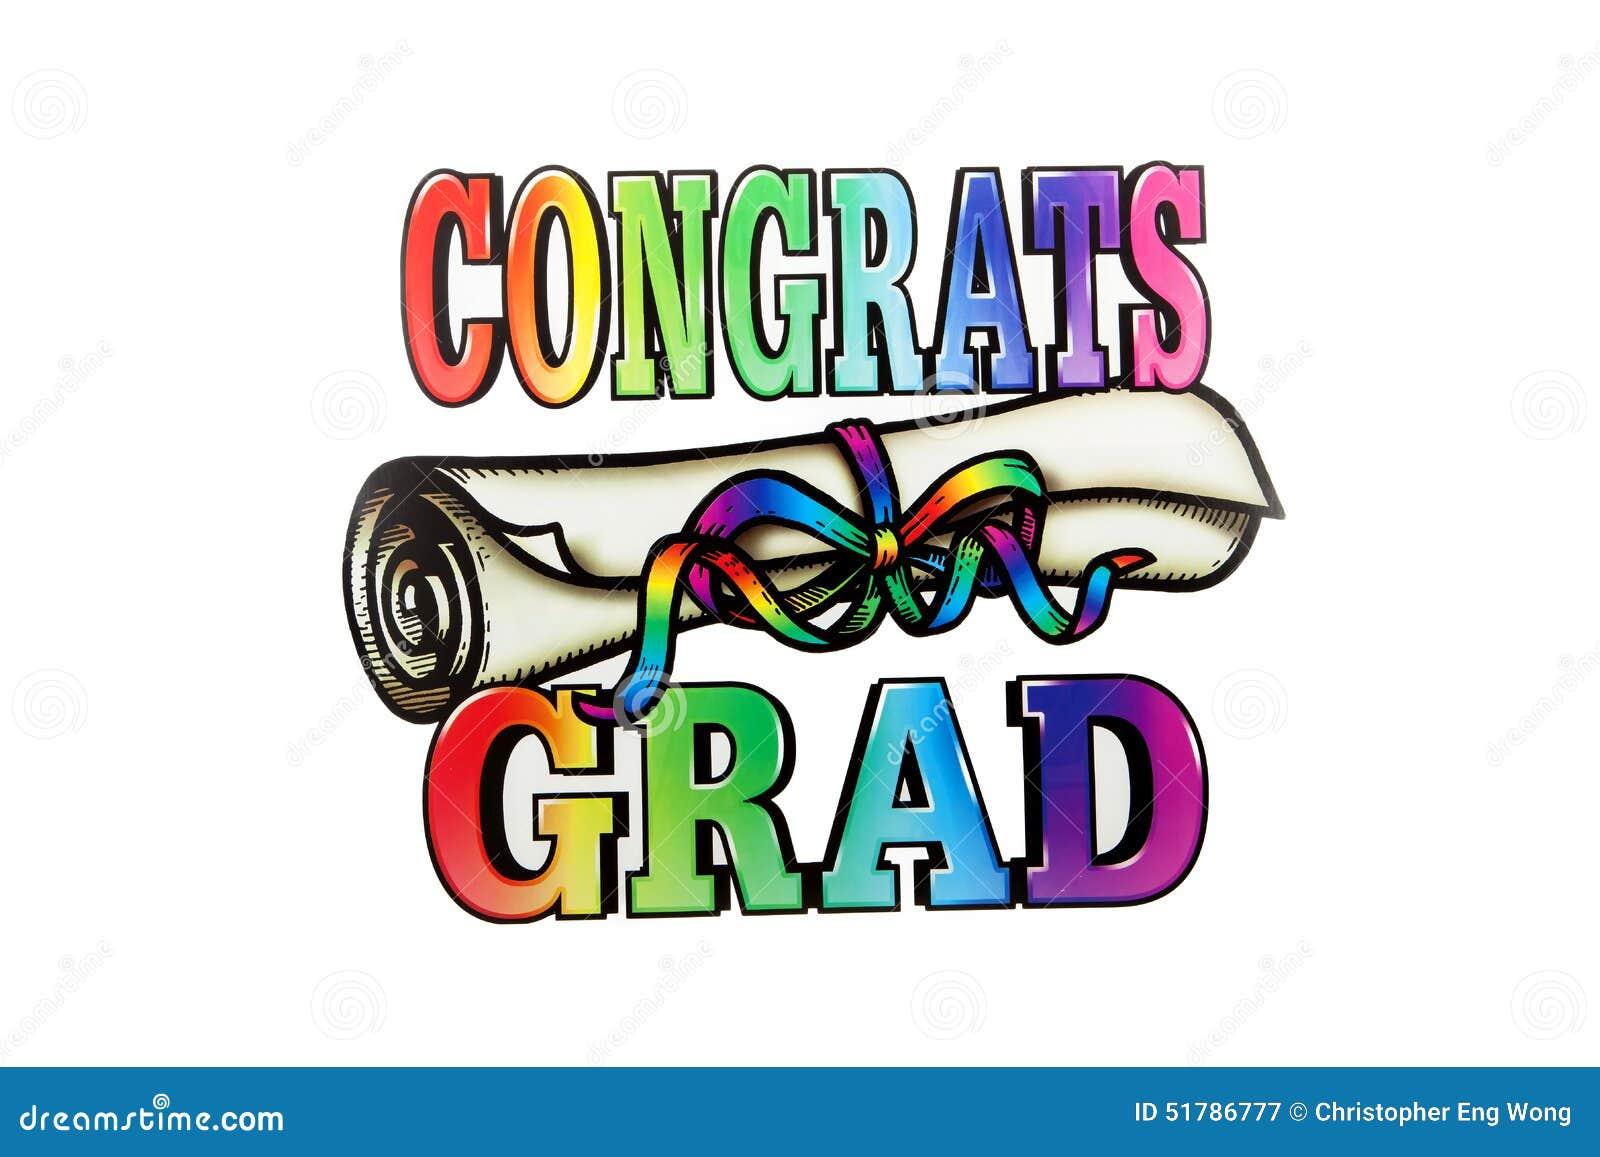 Congrats Grad Images Stock Illustration Image